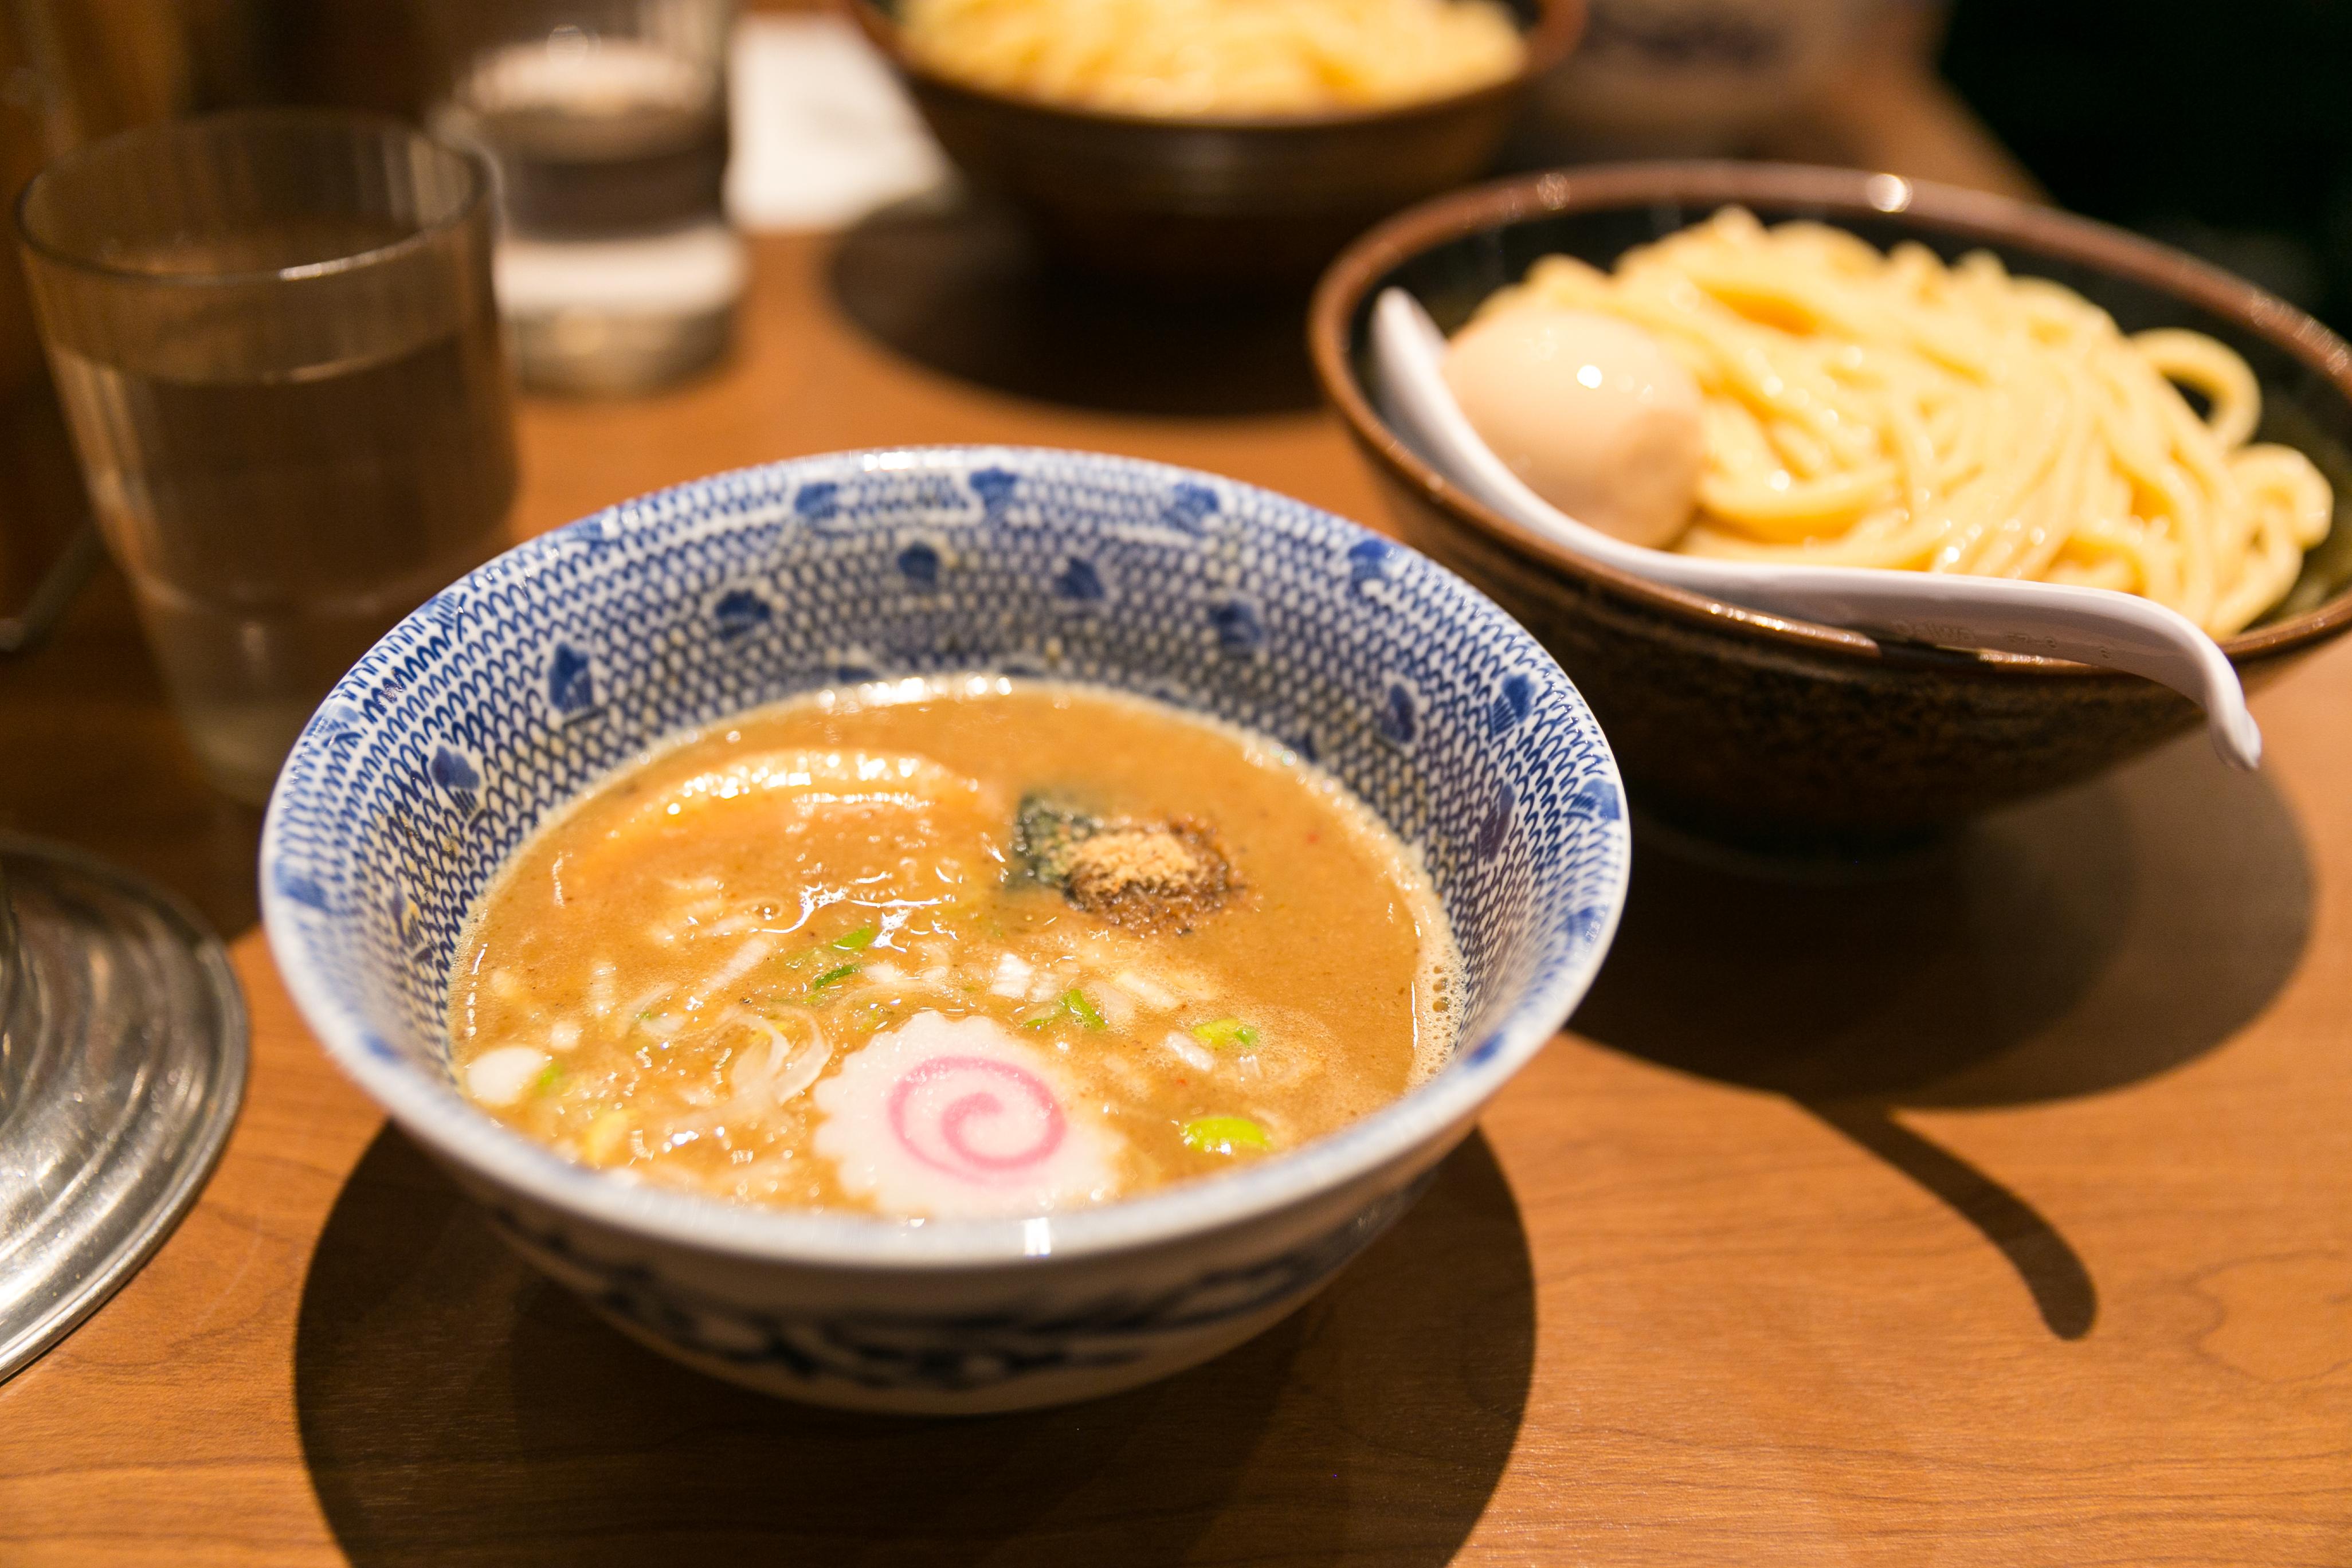 File:Tsukemen at a Tokyo restaurant.jpg - Wikimedia Commons